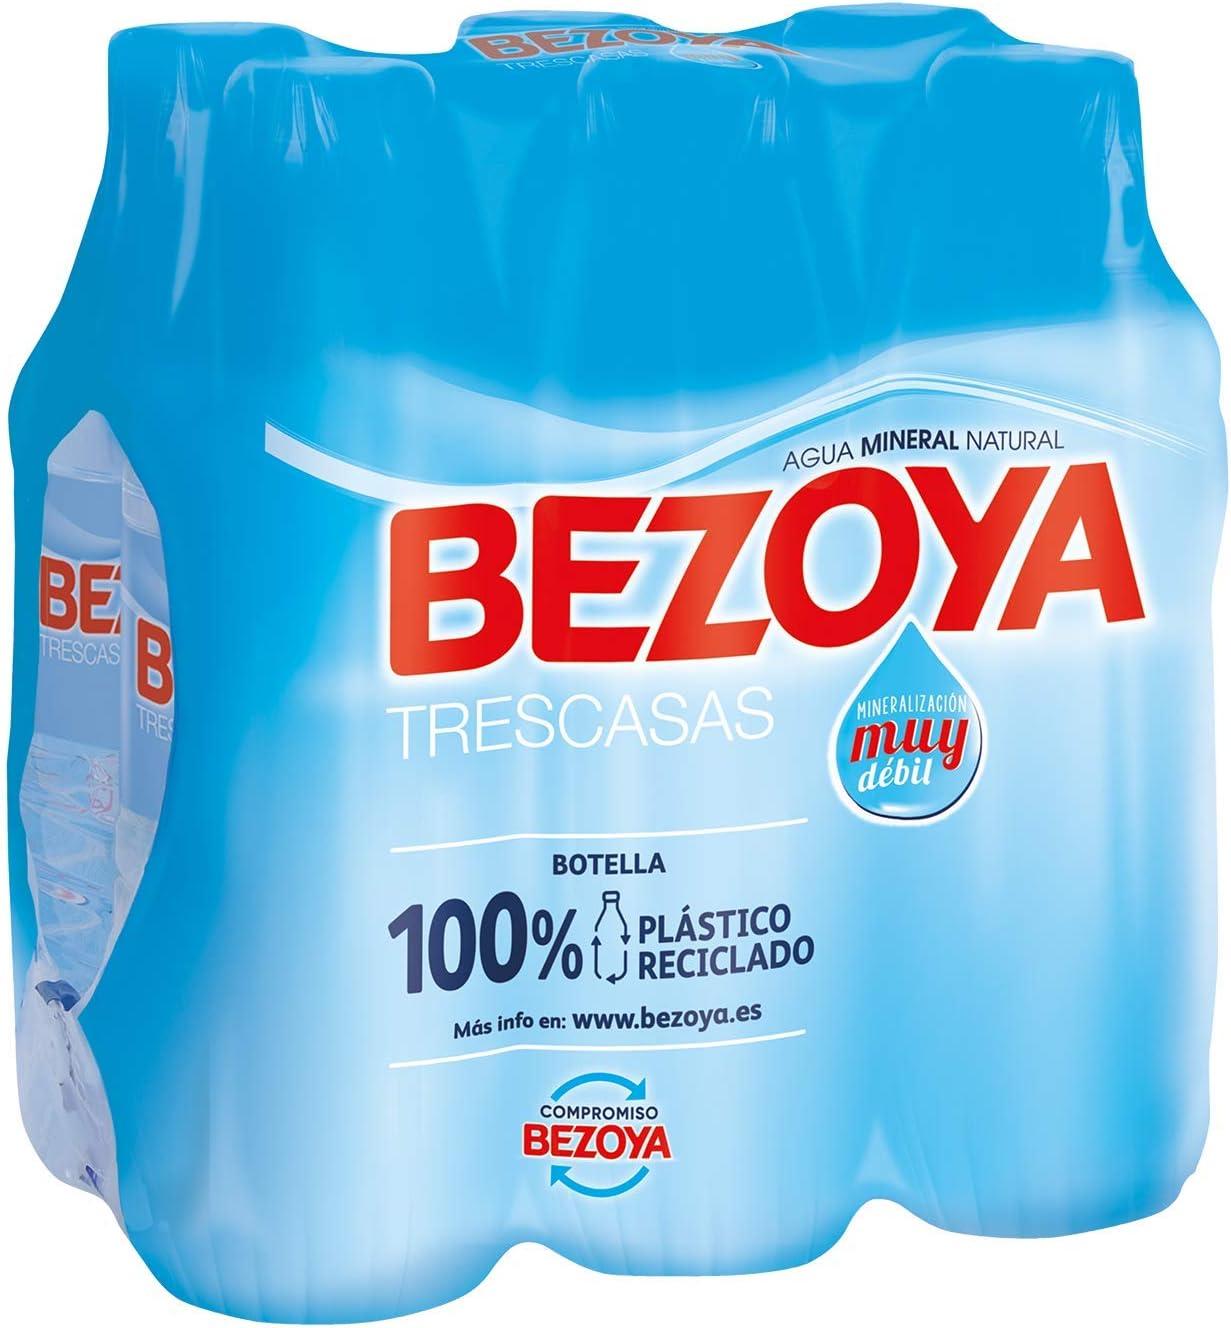 Bezoya - Agua Mineral Natural - Pack 6 x 50 cl: Amazon.es ...